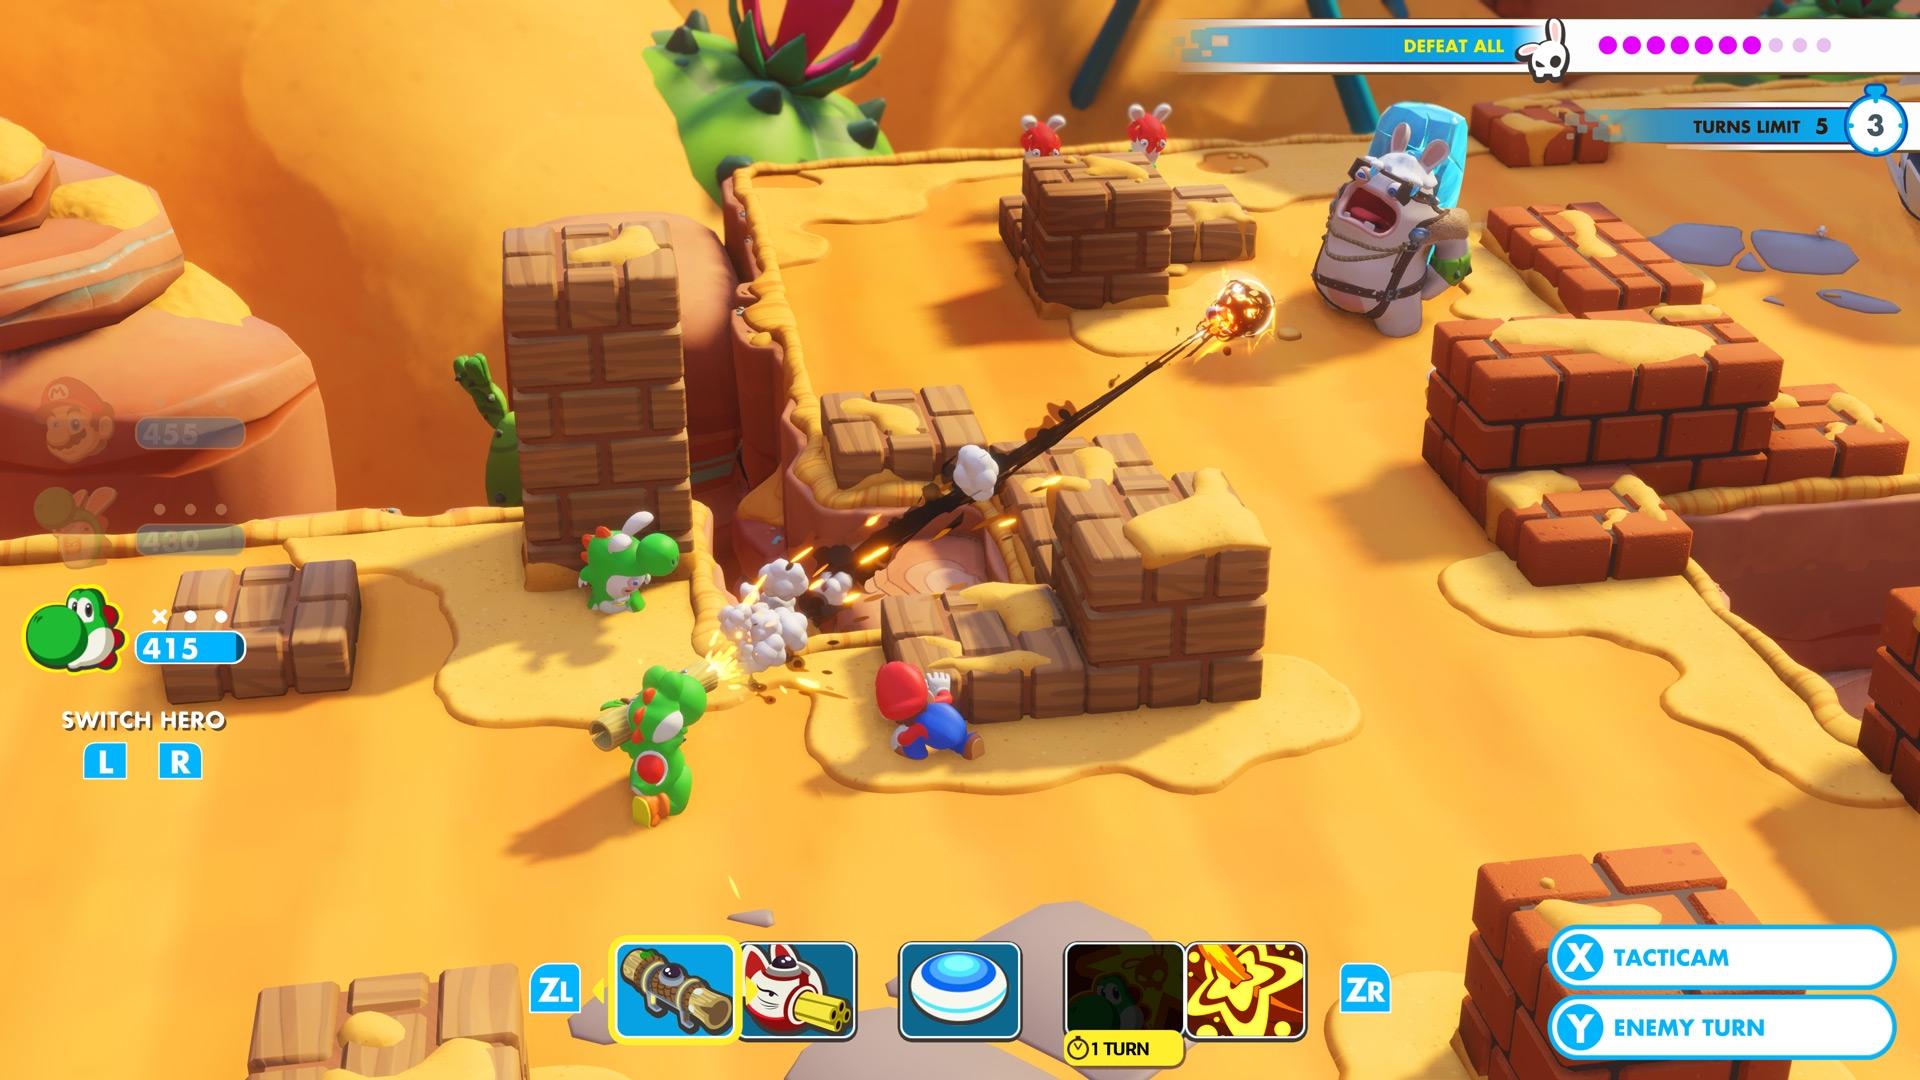 Mario + Rabbids Kingdom Battle – 5 Beginner Tips for Success | DeviceDaily.com